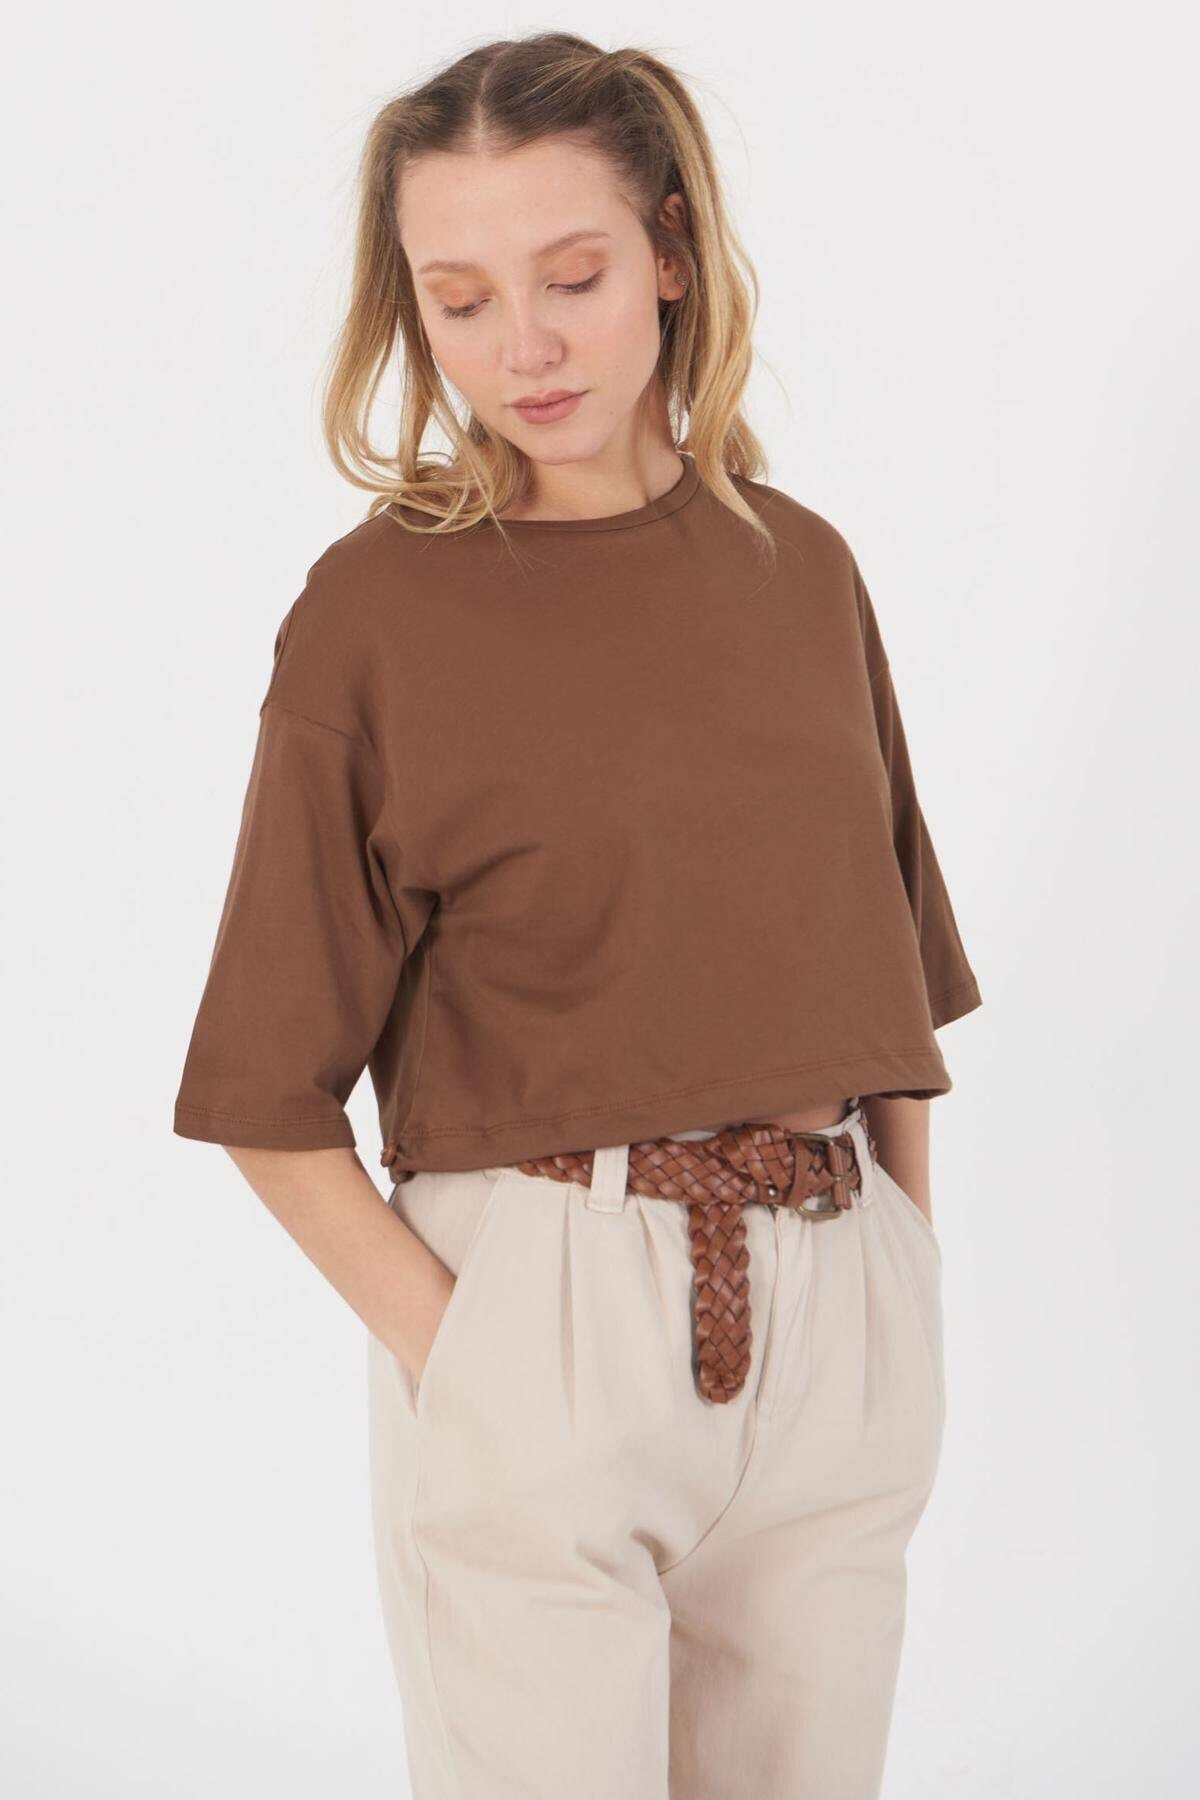 Addax Kadın Kahve Basic T-Shirt B112 - J8 Adx-0000023873 2